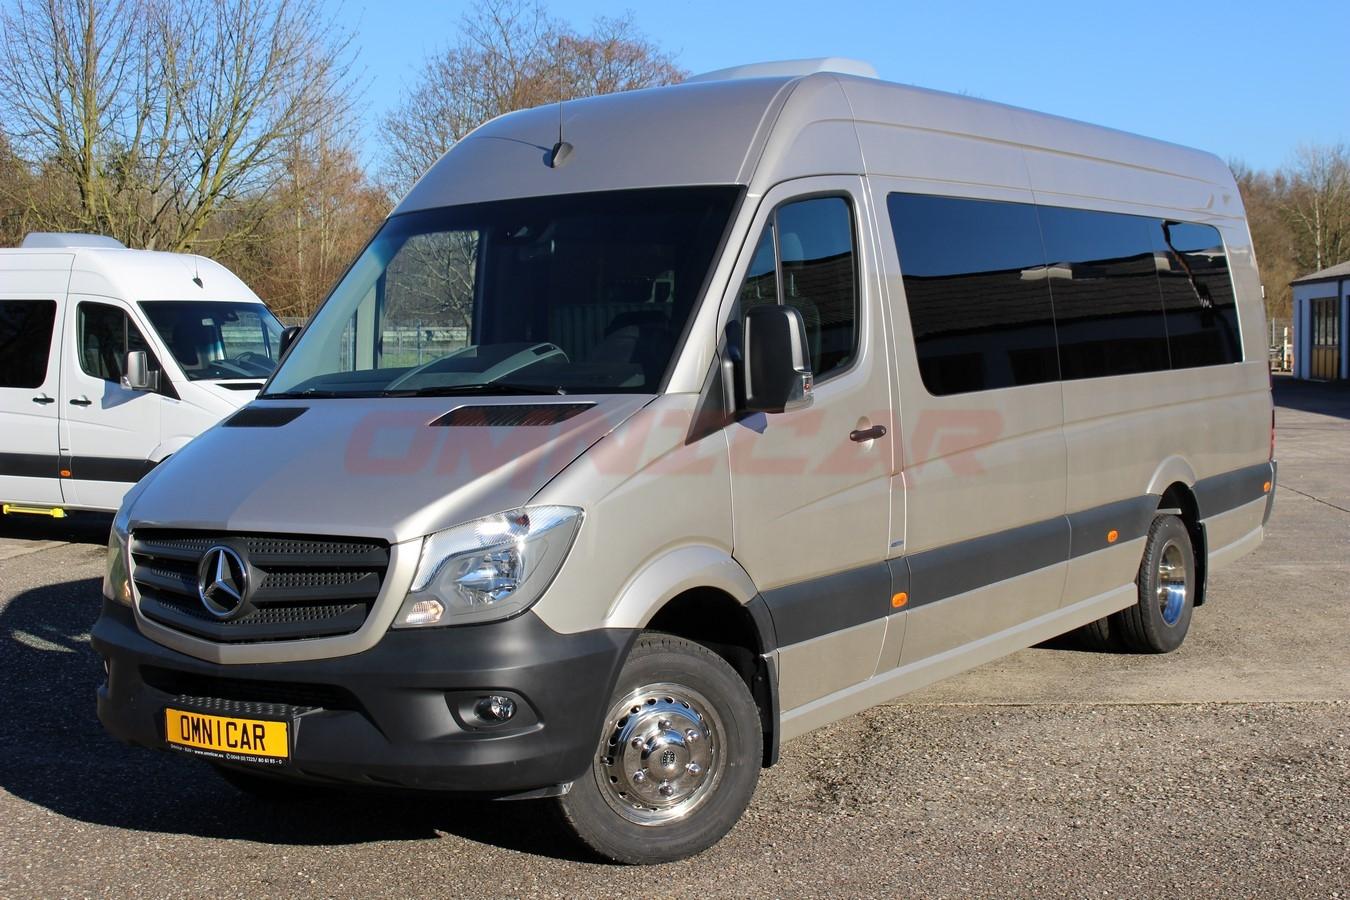 minibus mercedes sprinter neuf 516 cdi mix tourisme 22 1 places omnicar gmbh. Black Bedroom Furniture Sets. Home Design Ideas